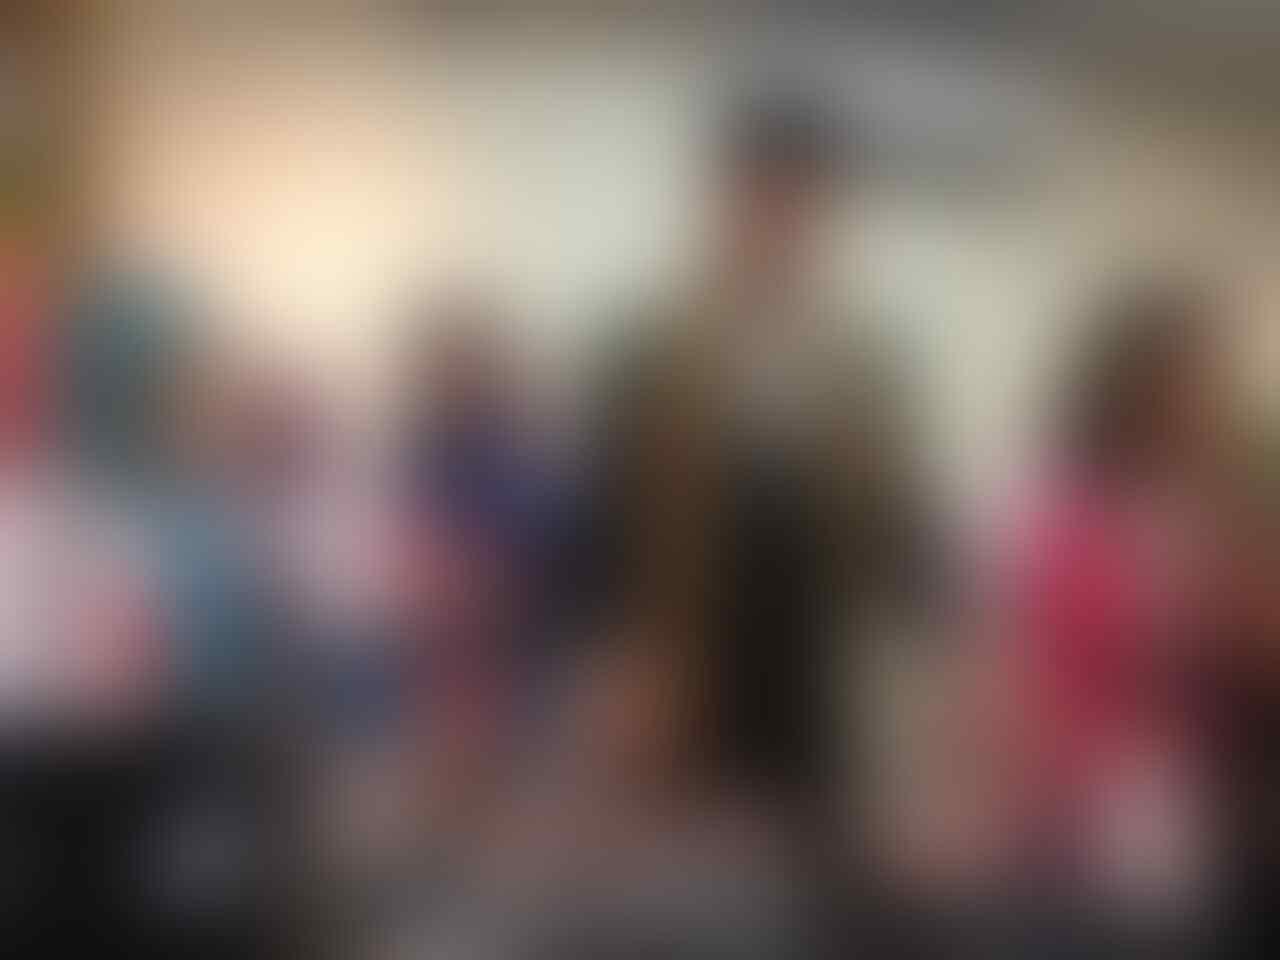 3 Fakta Sam Aliano, Pengusaha Muda 'Tajir Mlintir' yang Siap Nyapres di 2019